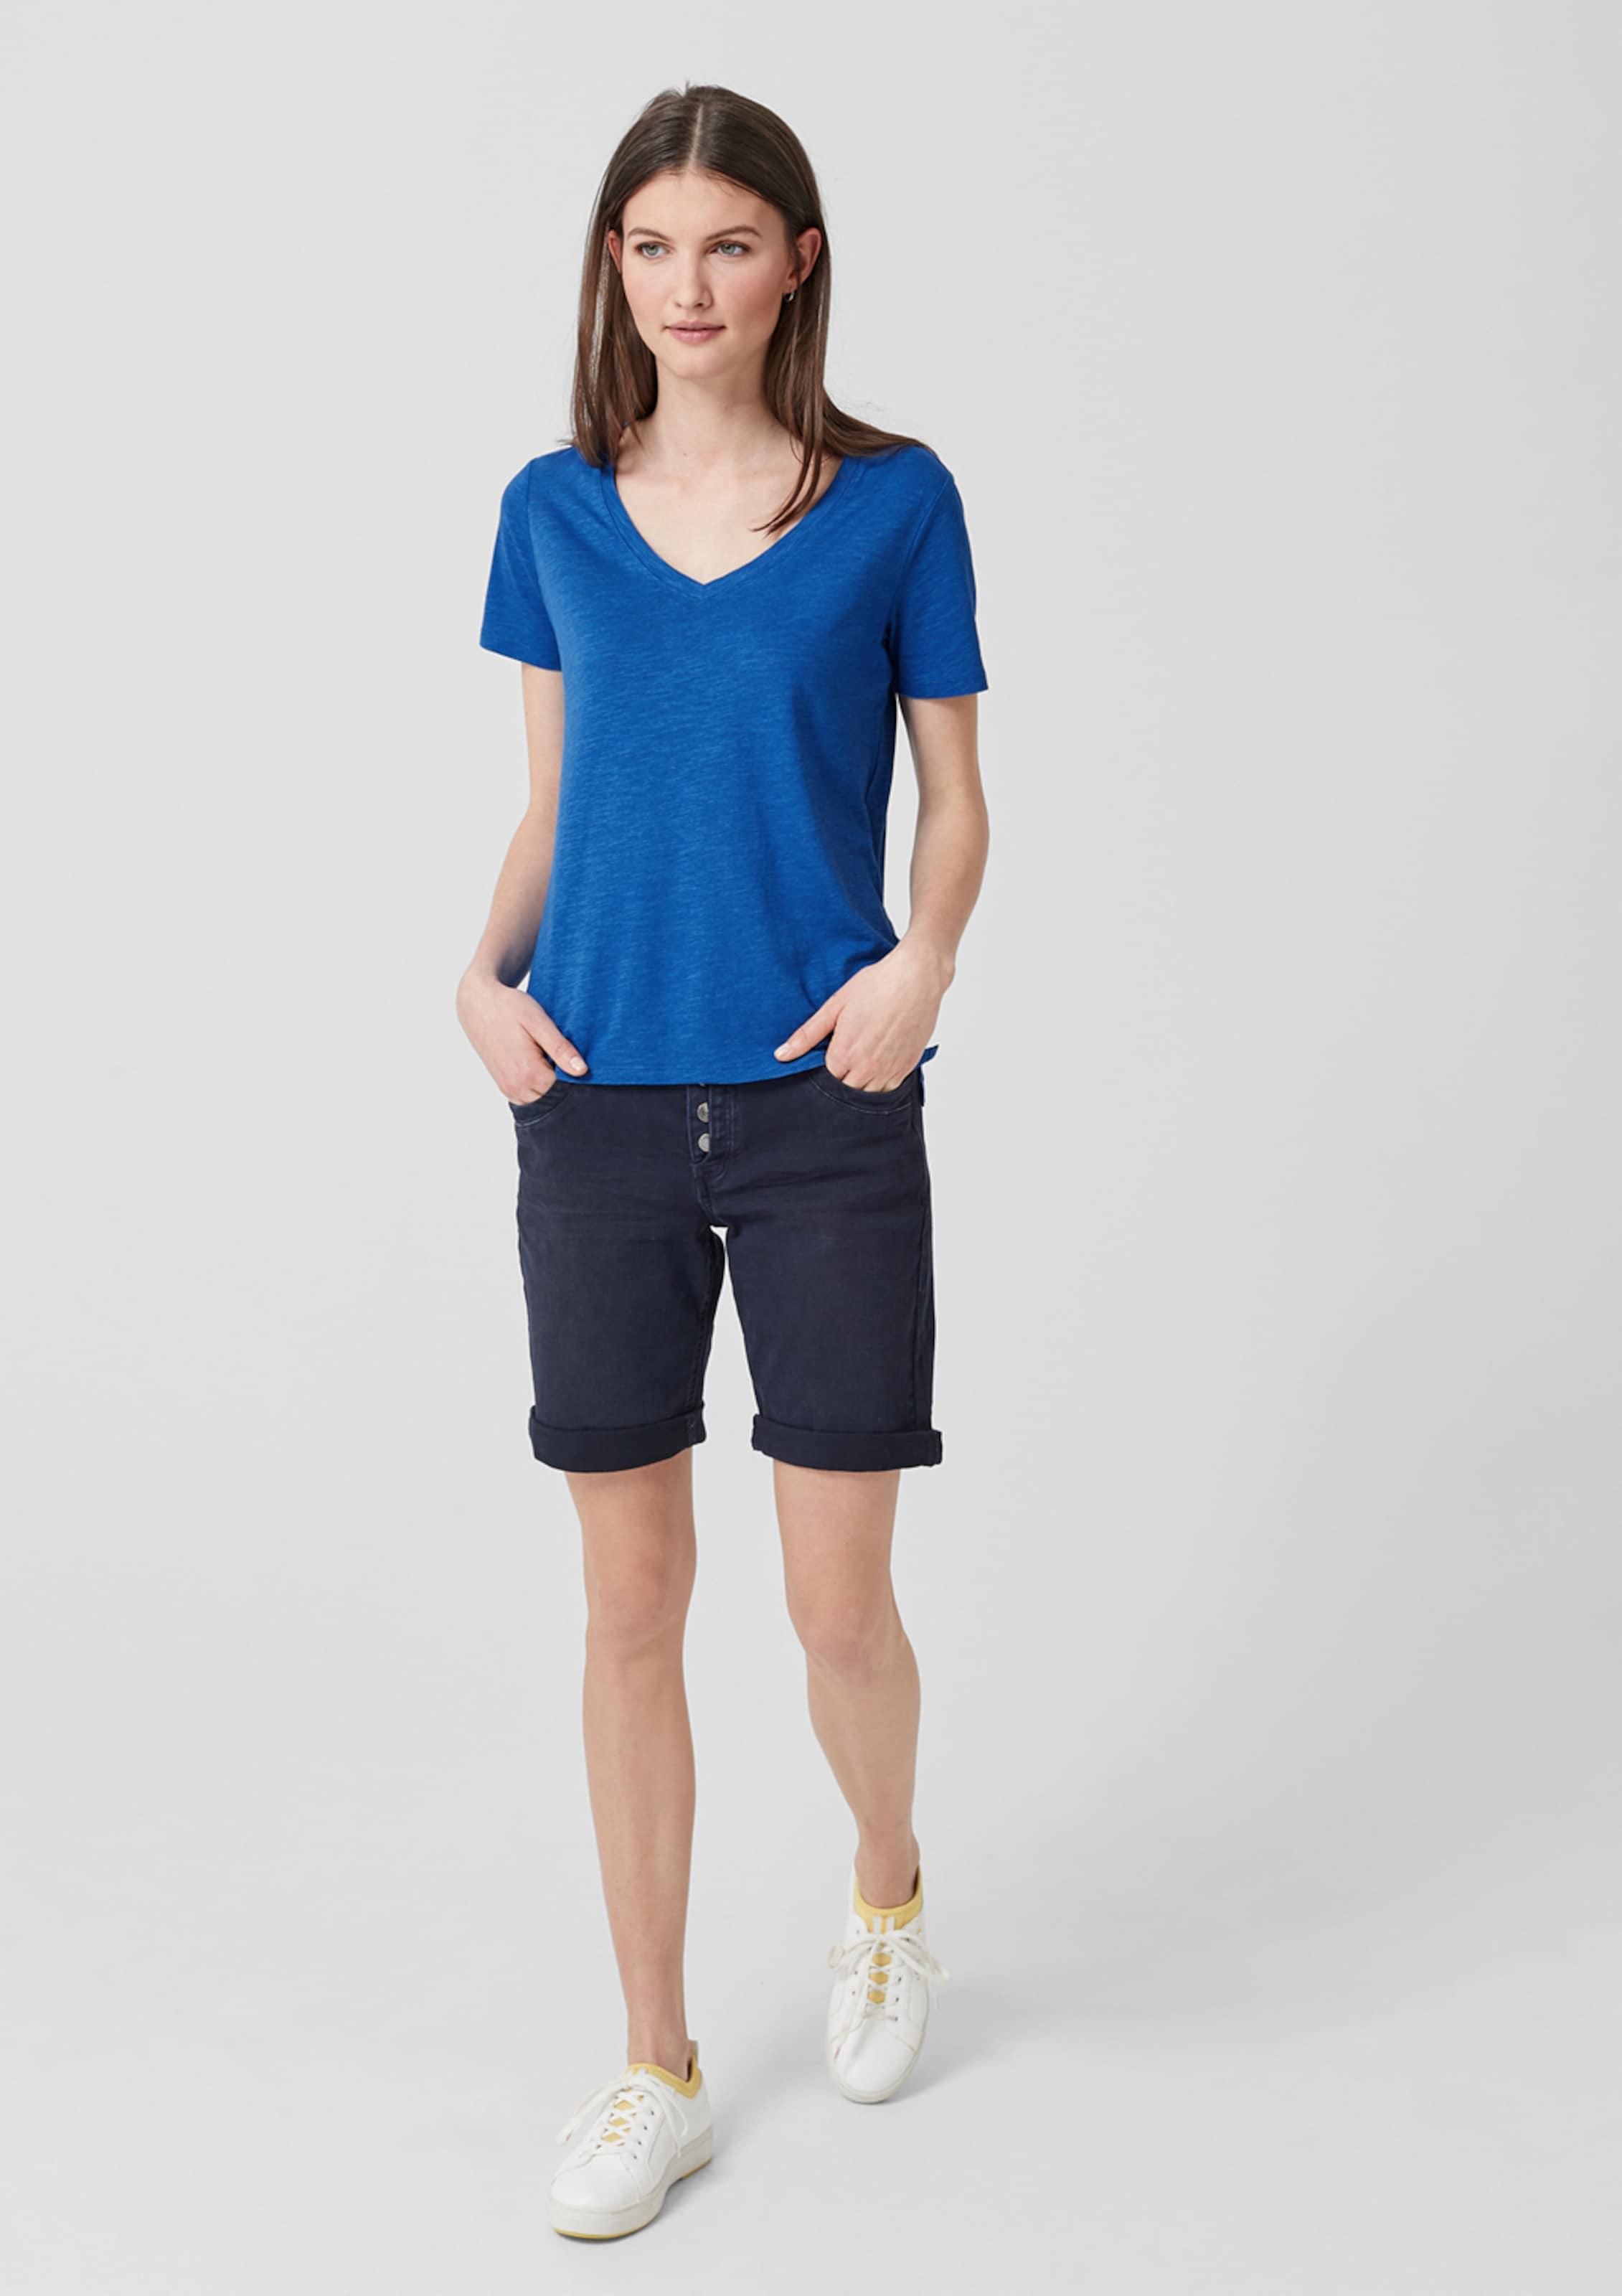 oliver Red Blau S Label In Shirt lFJcuK5T13